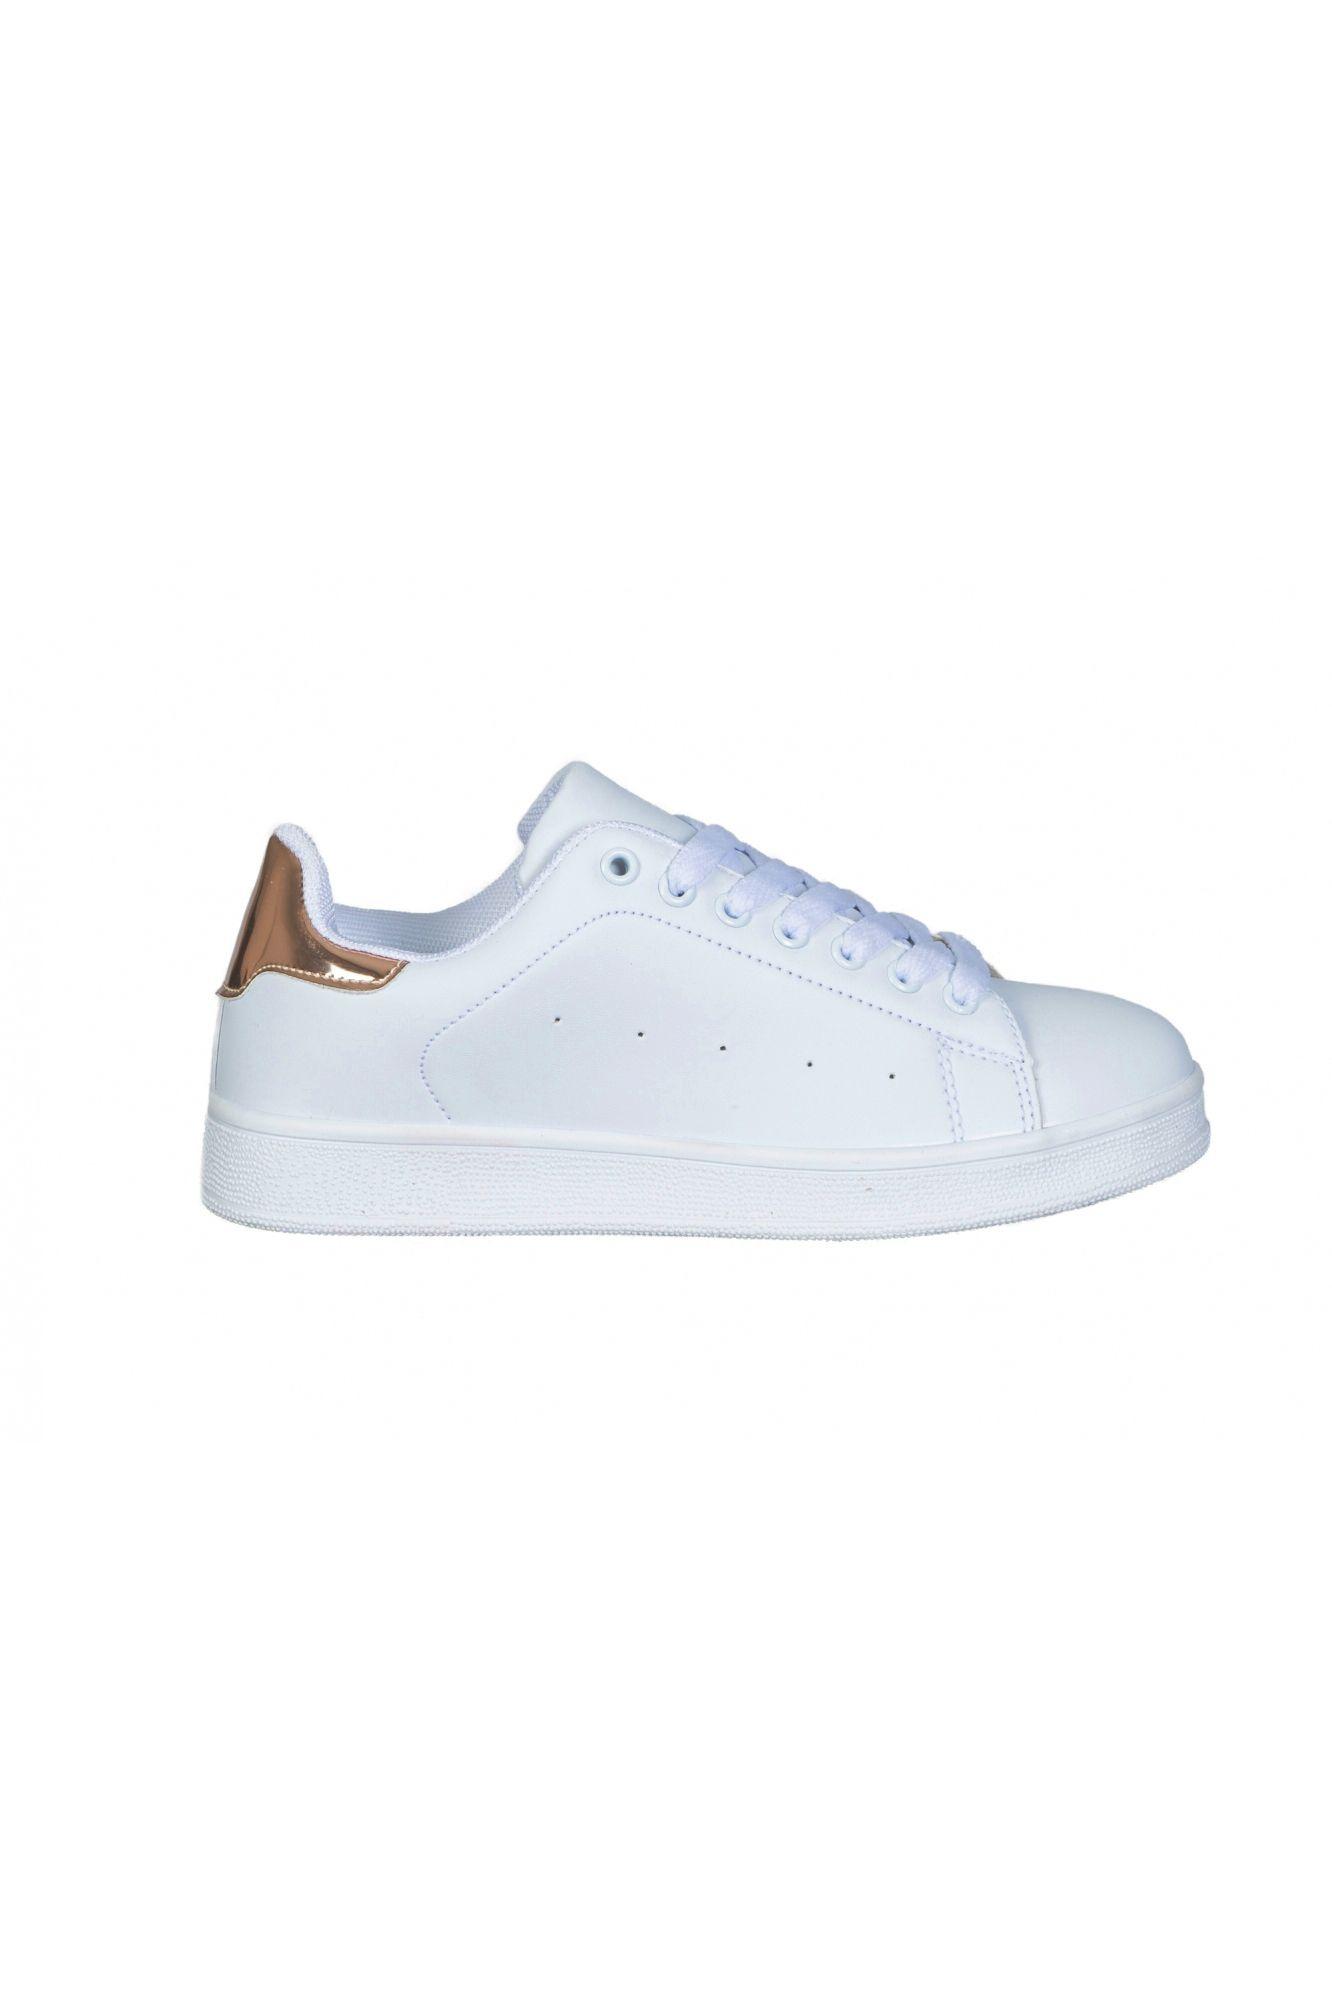 88ed5908c9f Γυναικείο παπούτσι sneakers τύπου stan smith άσπρο-champagne. σνικερς, λευκα  αθλητικα παπουτσια, σαμπανιζε υποδηματα